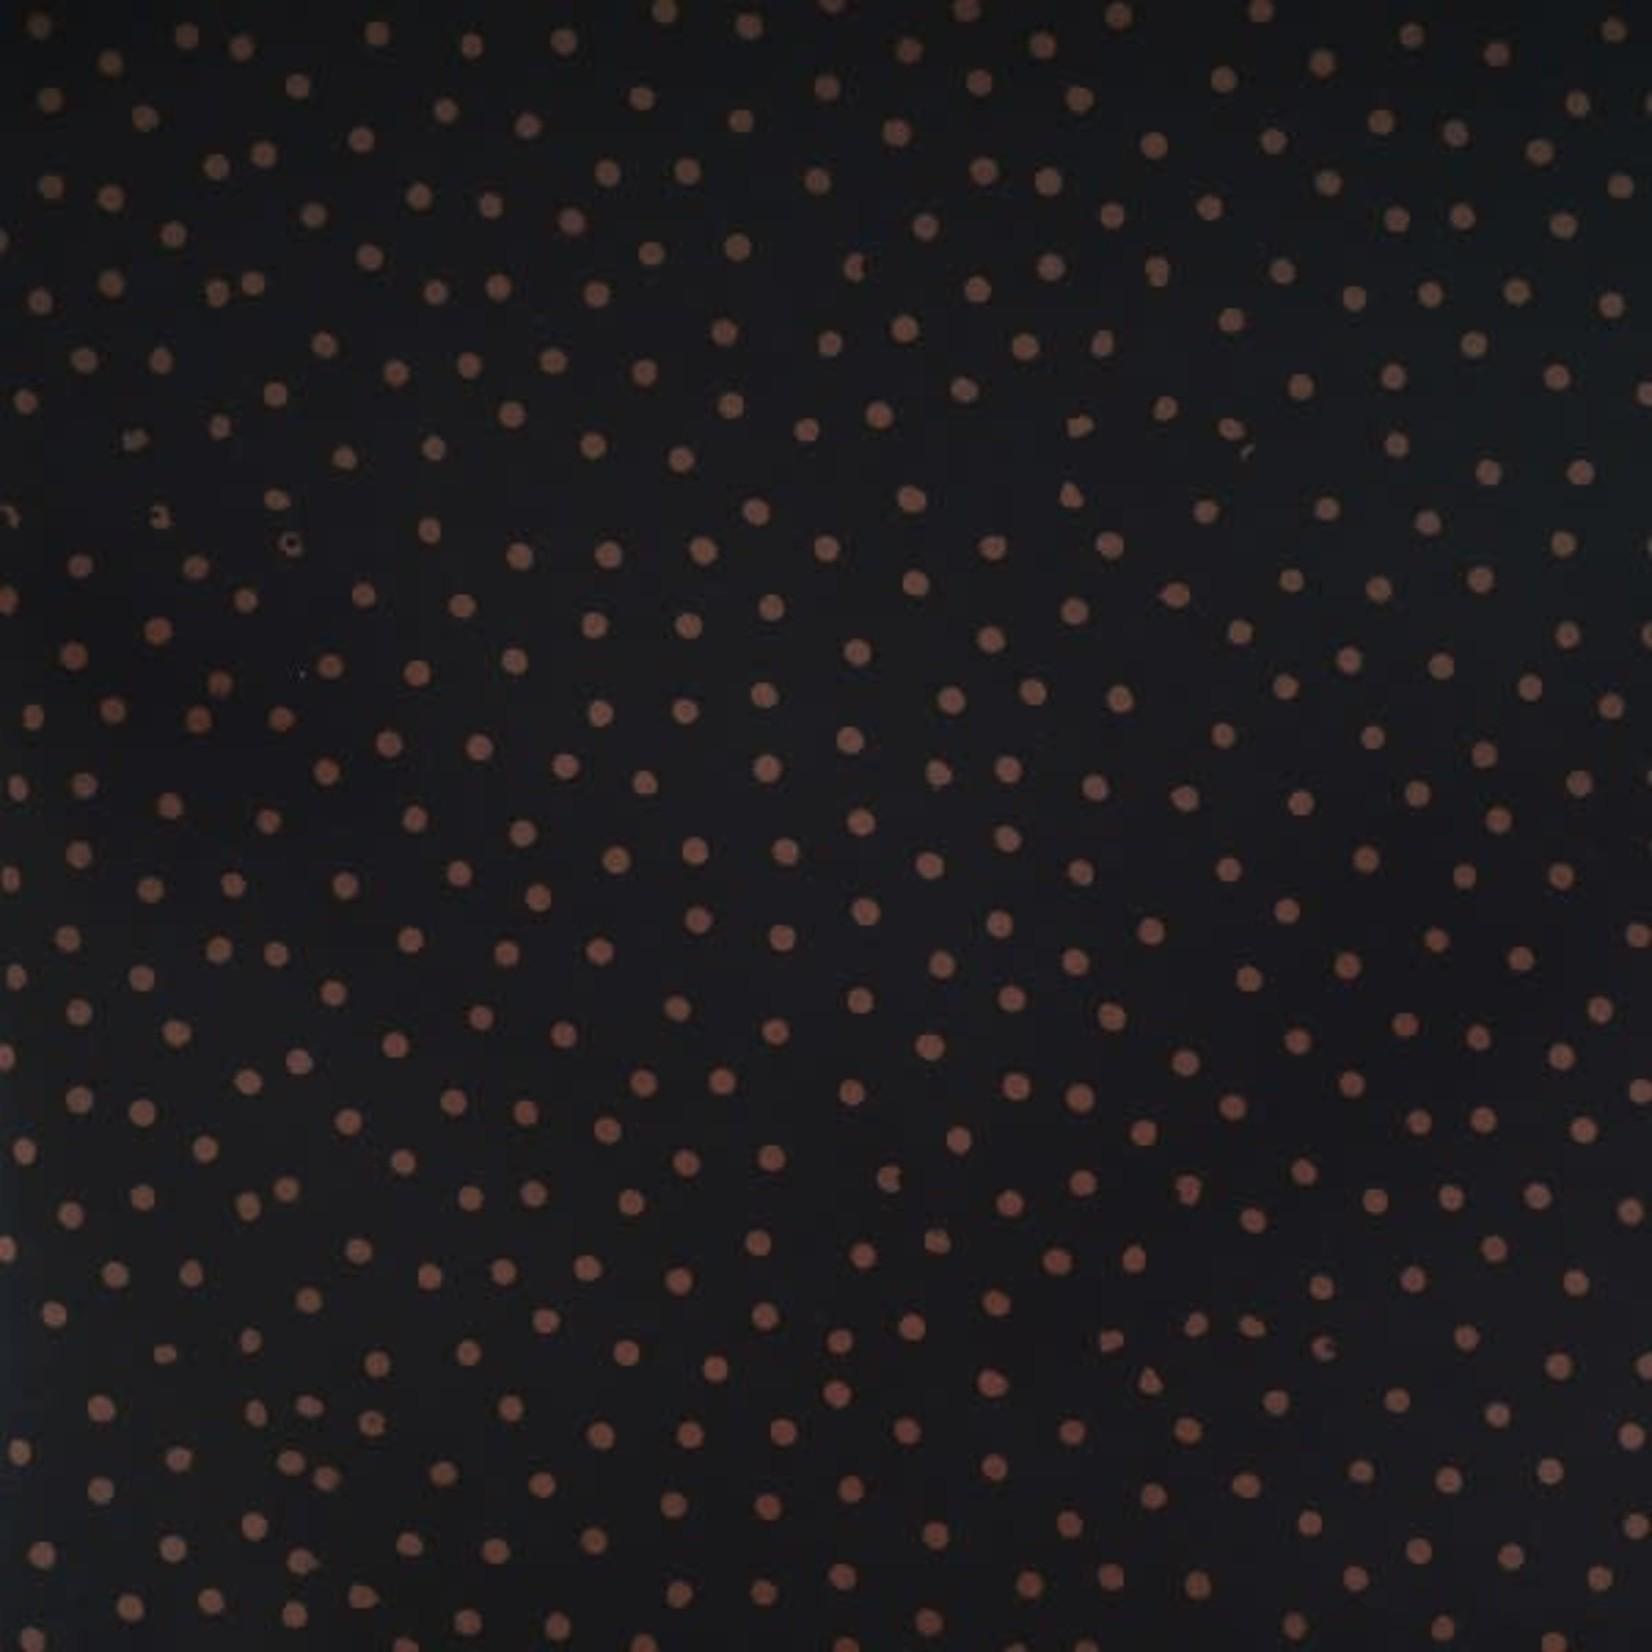 Cador NIGHT CRUISE -  BROWN/BLACK (NC-2-13) PER CM OR $20/M